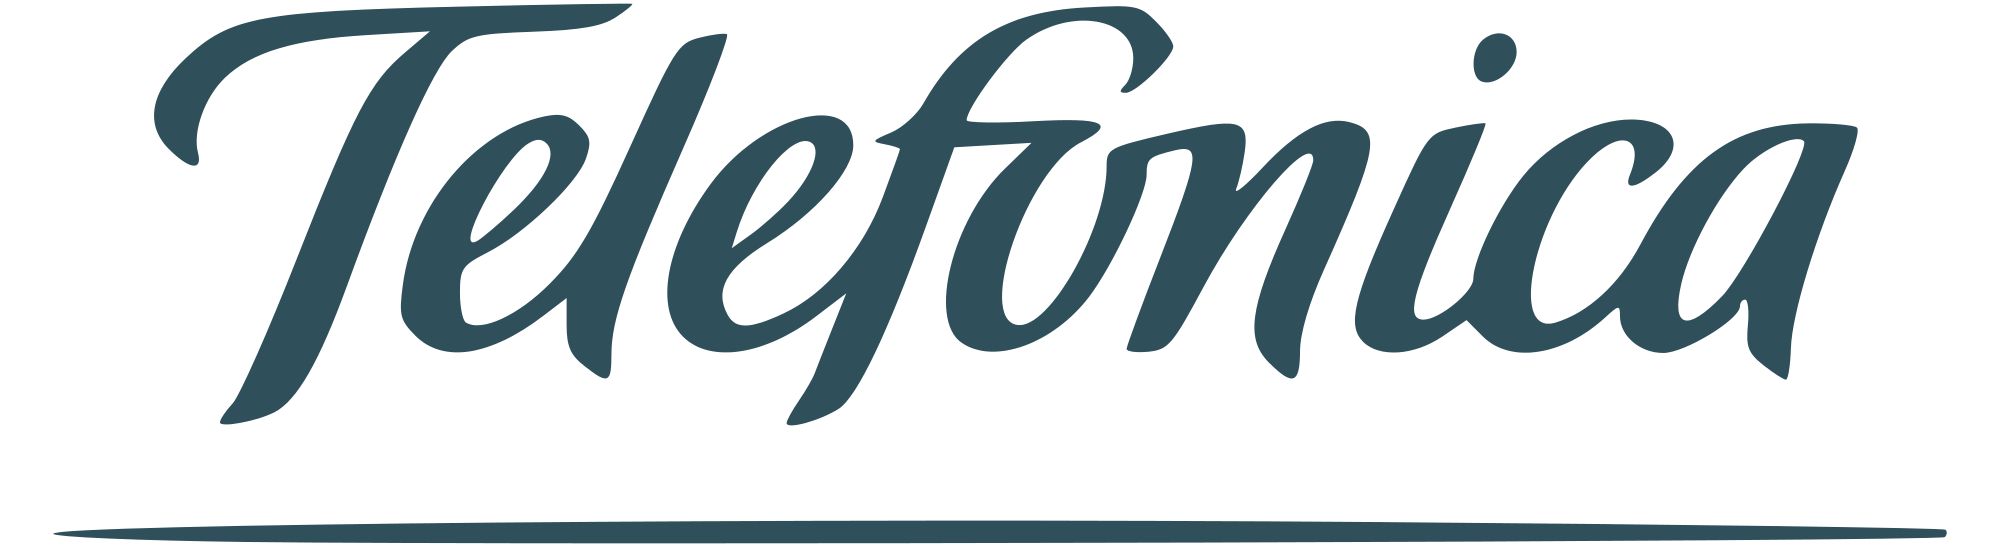 Telefonica Brazil (Vivo) Logo